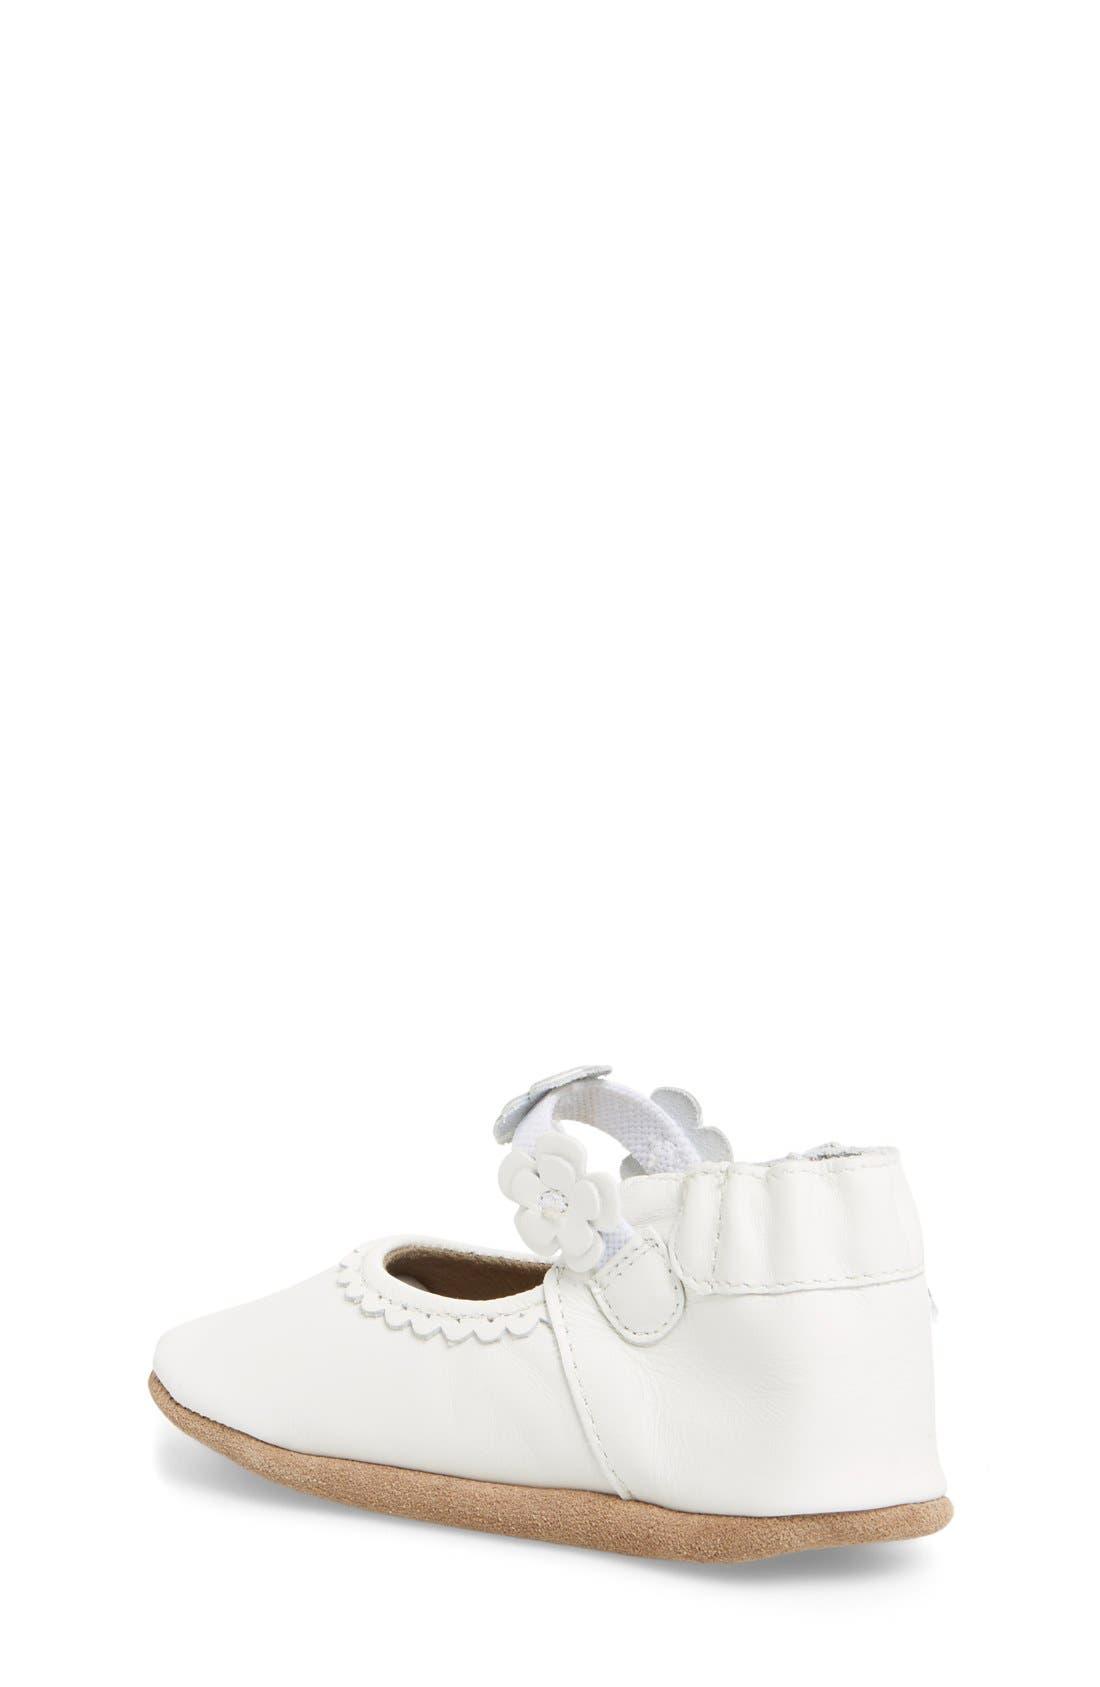 Alternate Image 2  - Robeez® 'Claire' Mary Jane Crib Shoe (Baby & Walker)